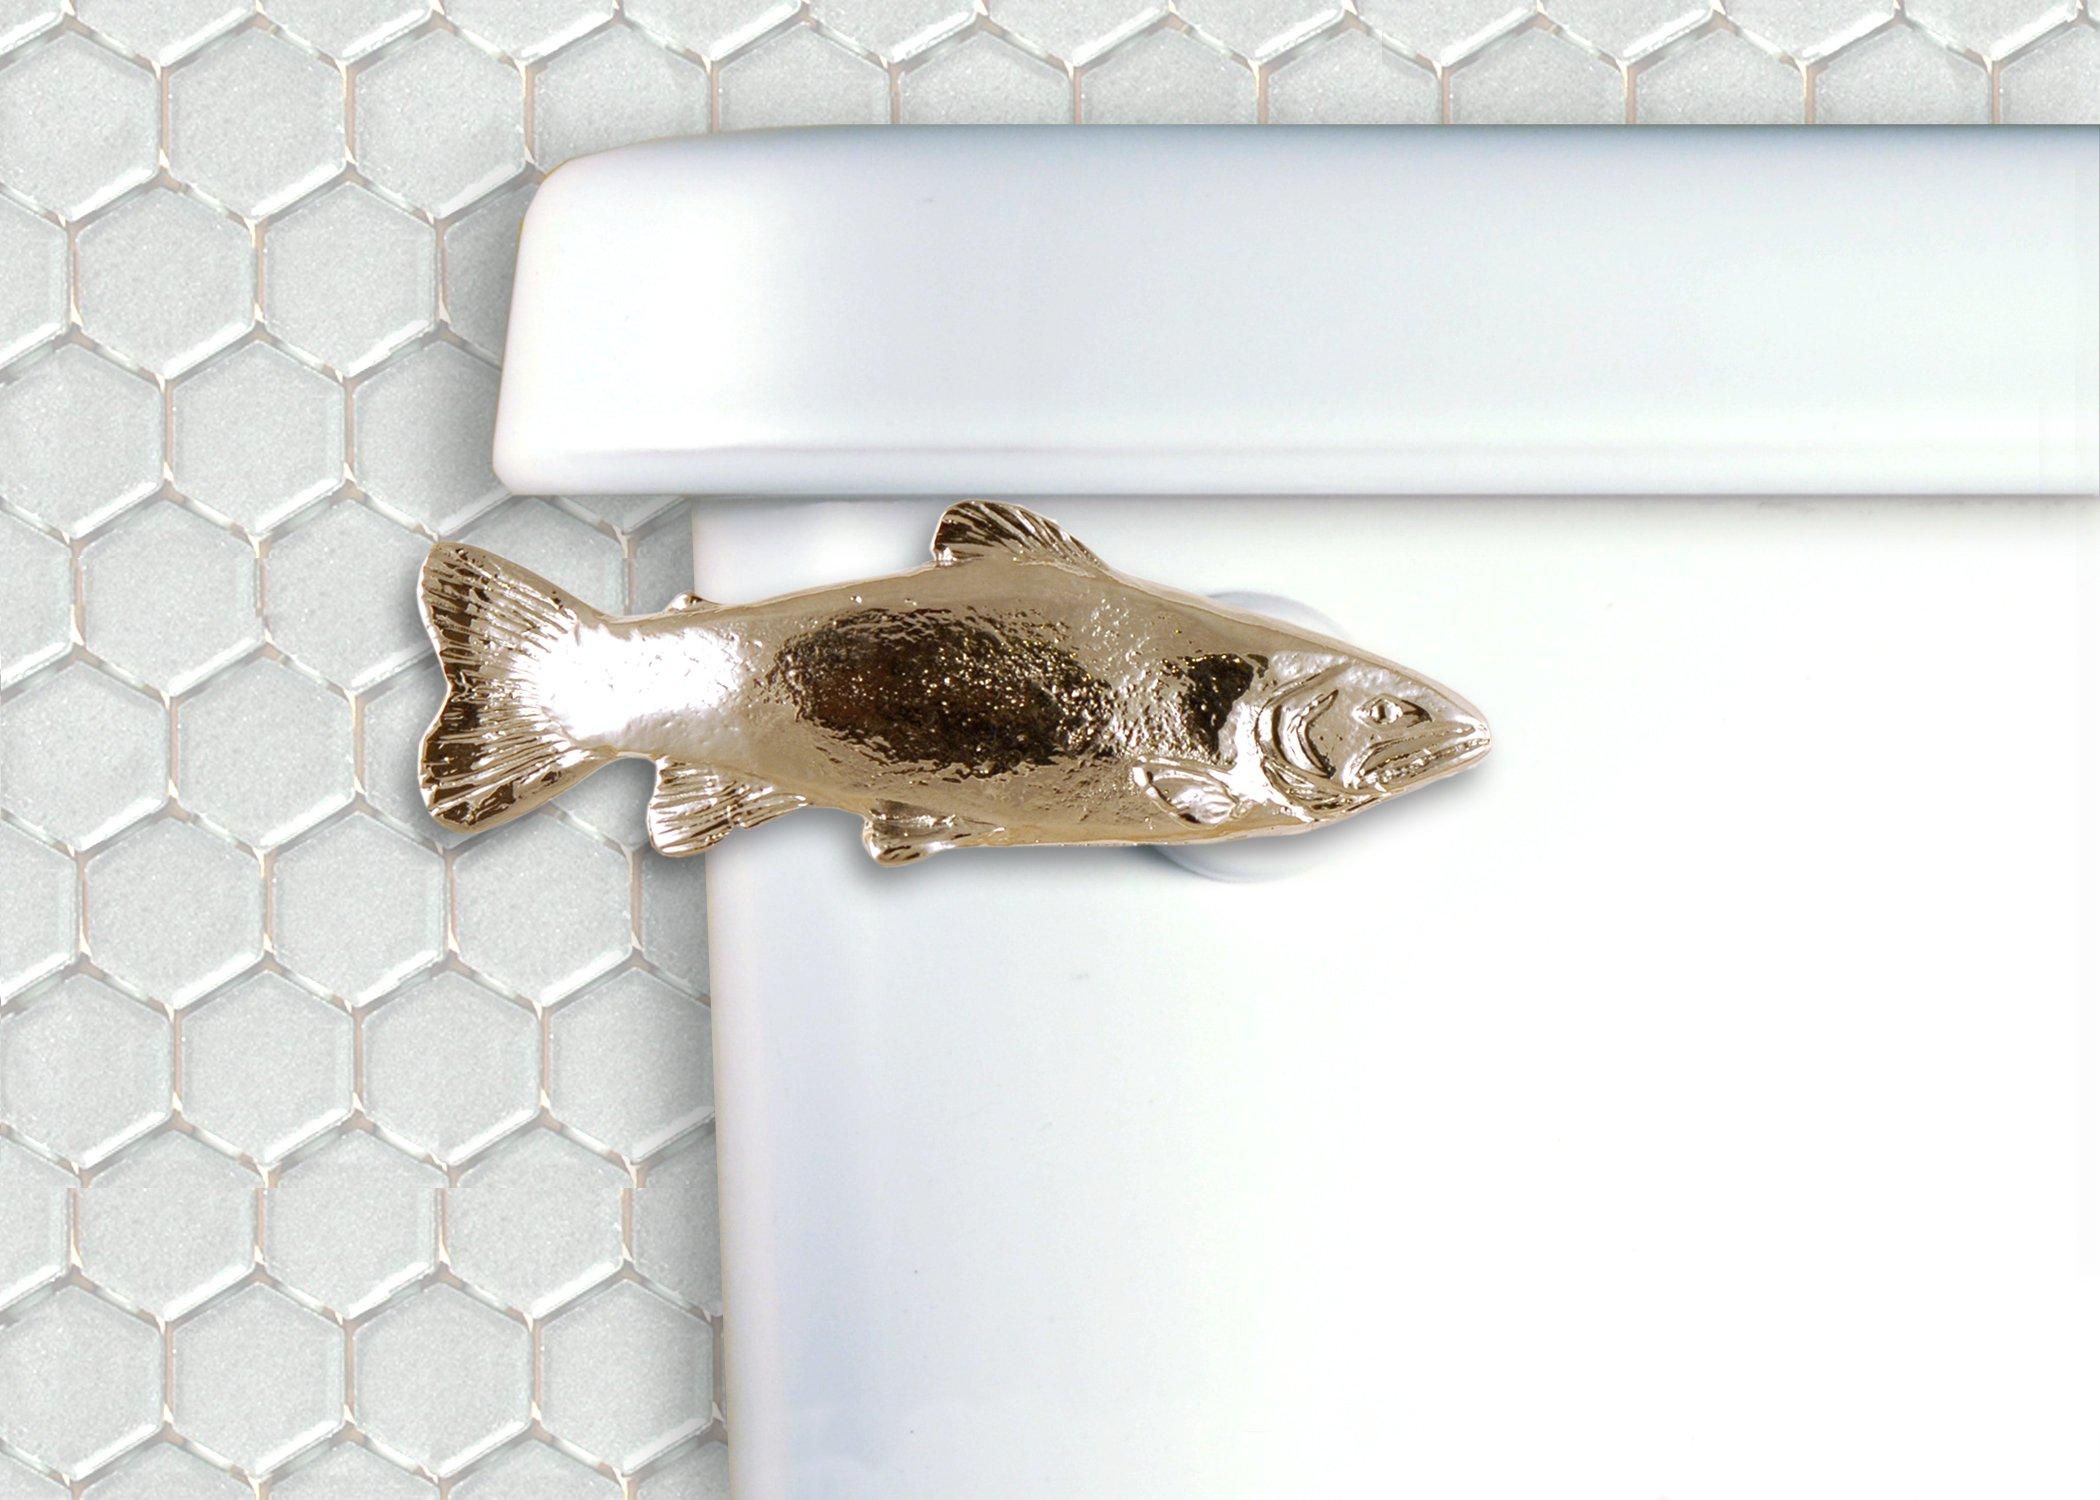 Functional Fine Art Trout Toilet Flush Handle - Front Mount - Chrome Finish by Functional Fine Art